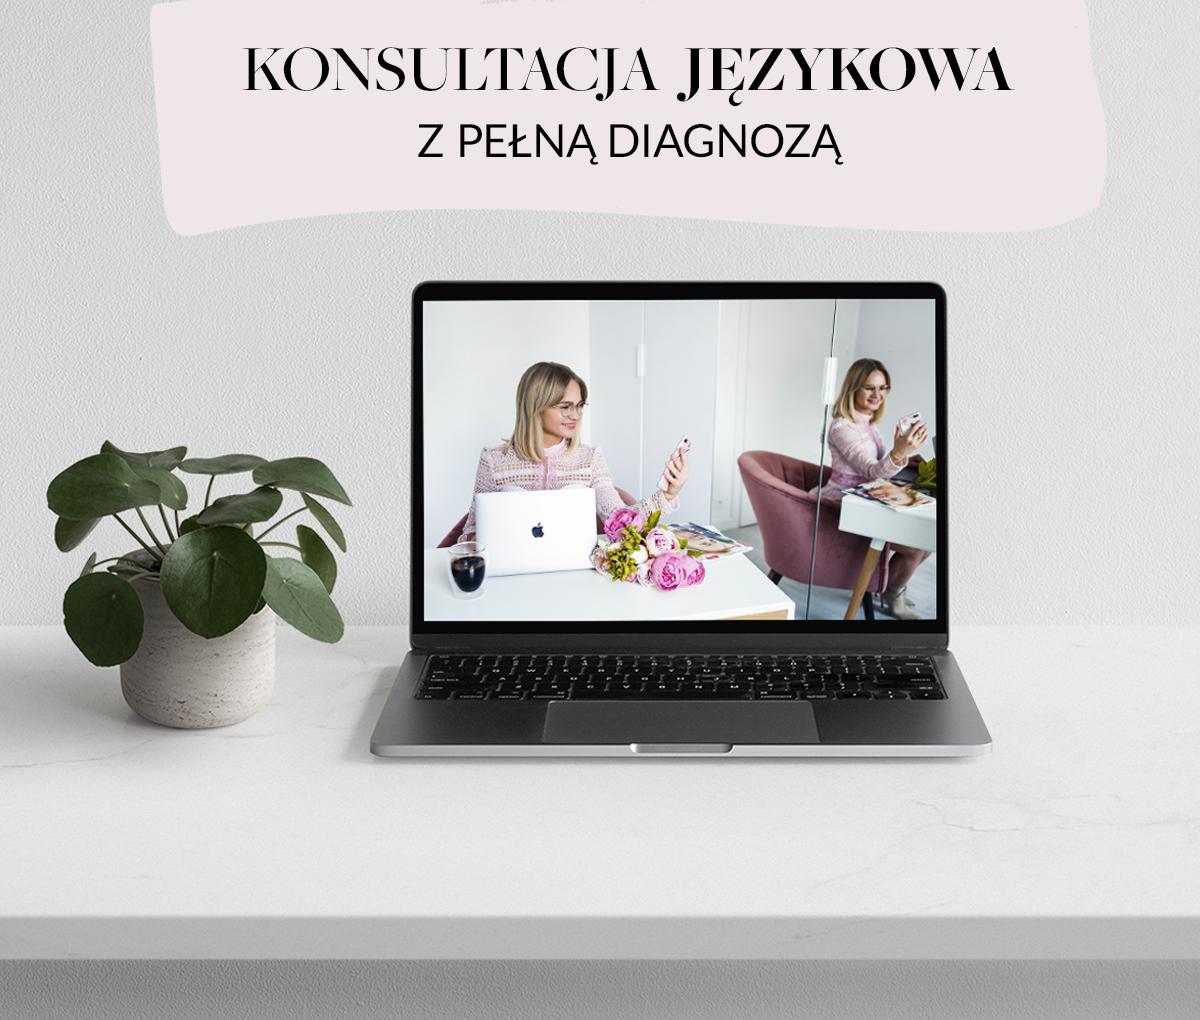 Justyna-Stogowska-Konsultacje